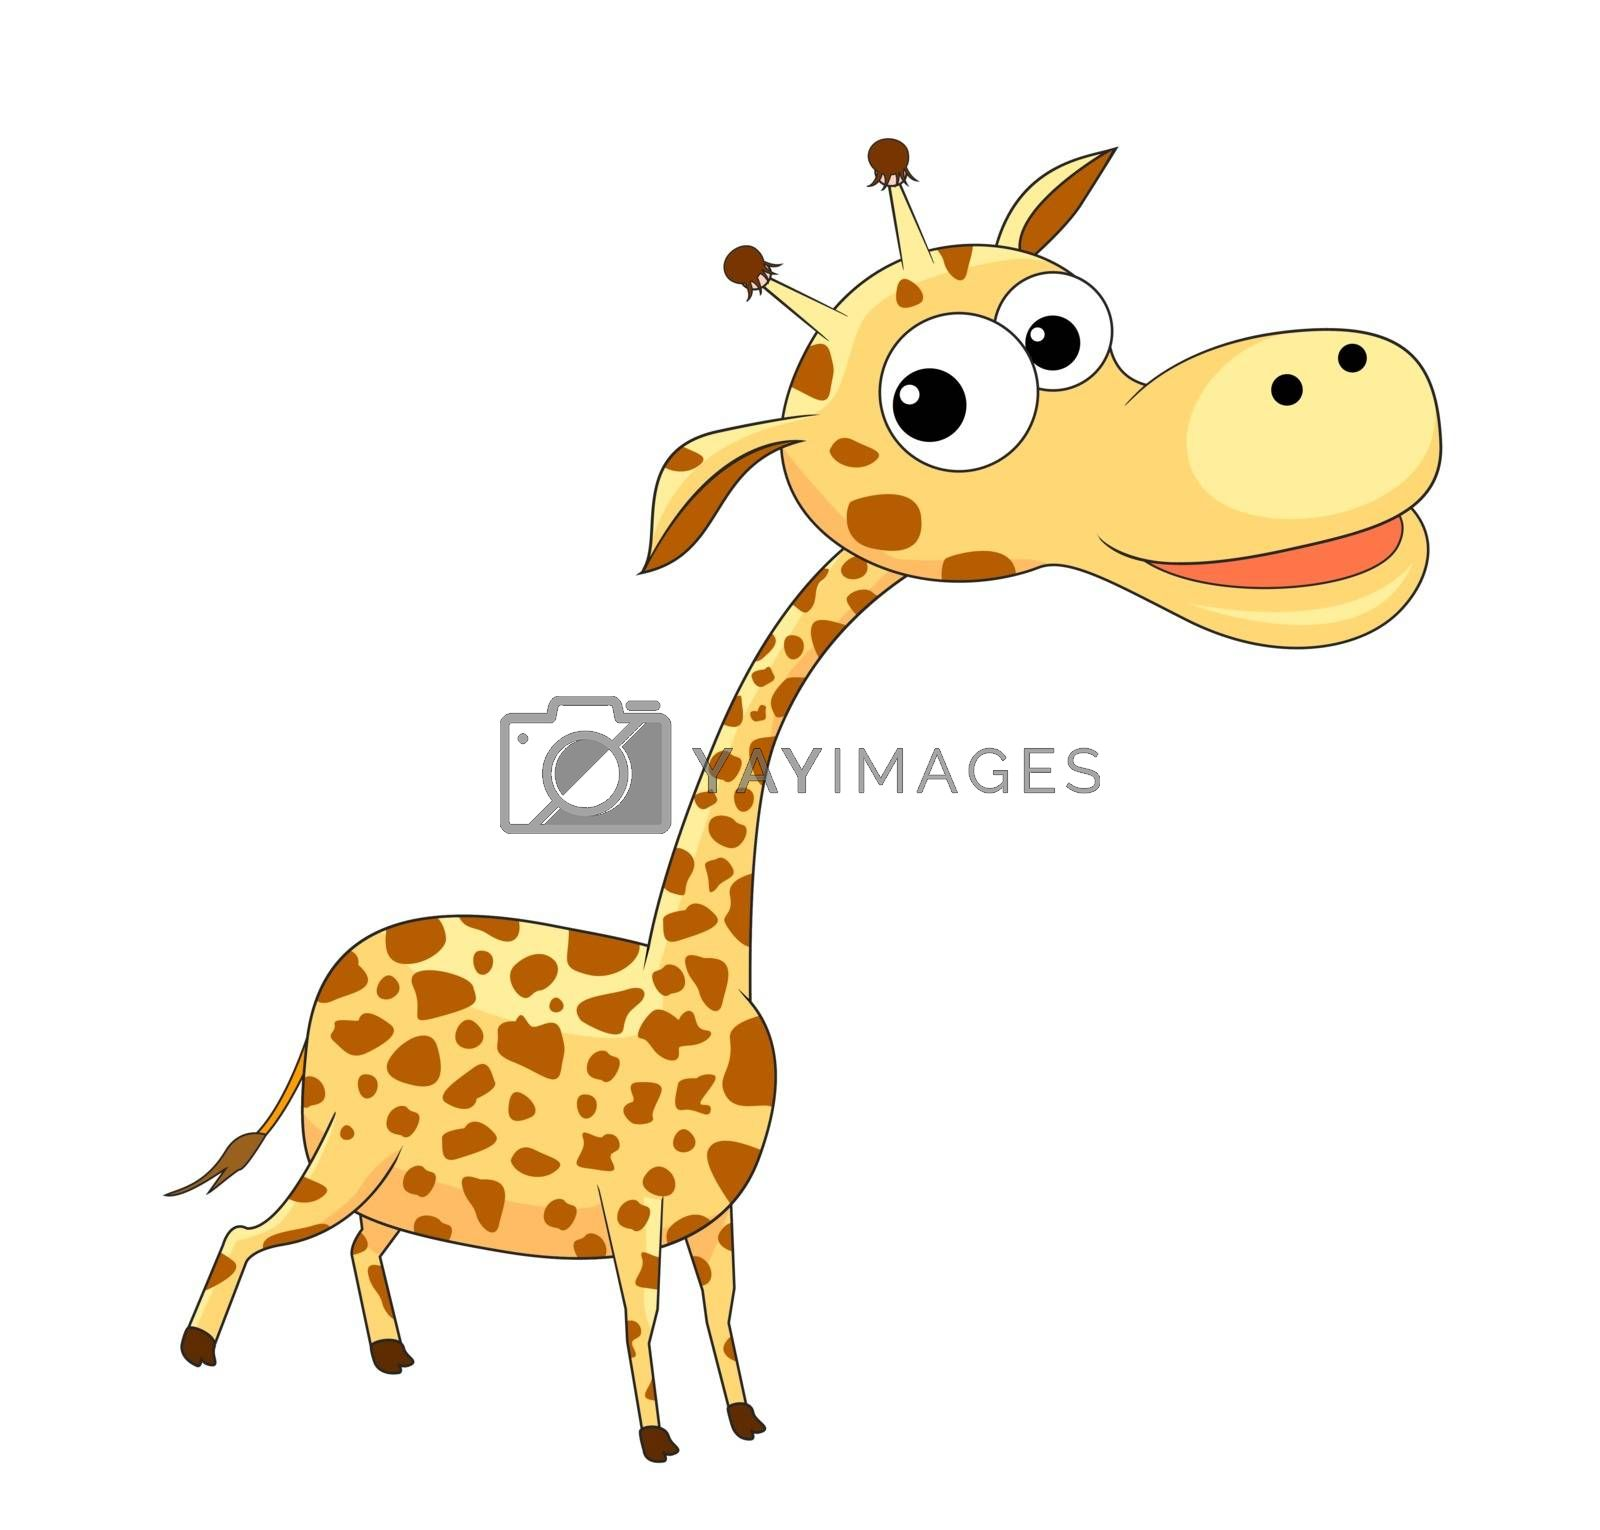 A small cartoon giraffe on a white background.